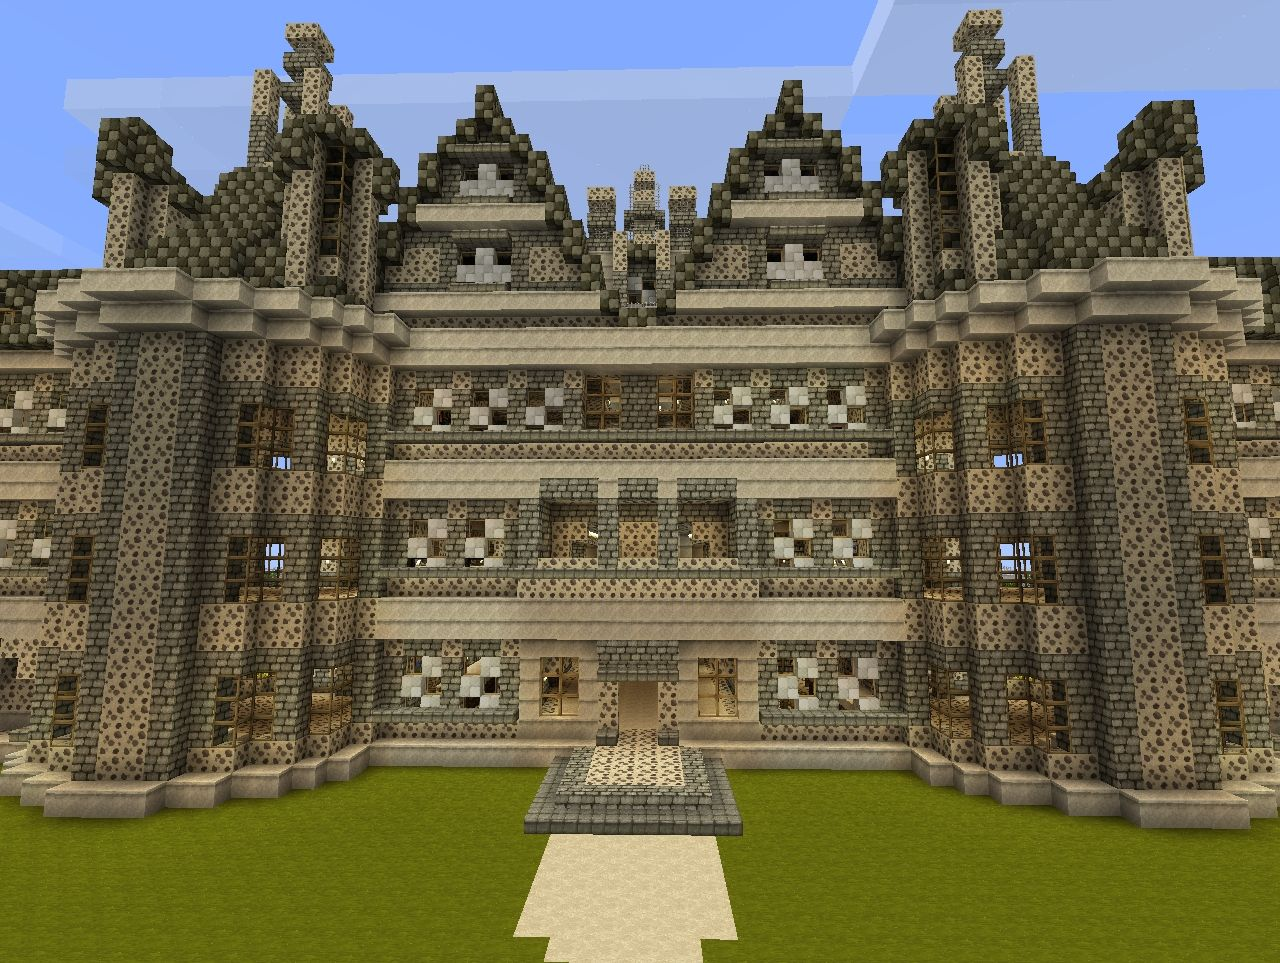 Chateau de chambord castle of cambord minecraft project - Chateau de minecraft ...